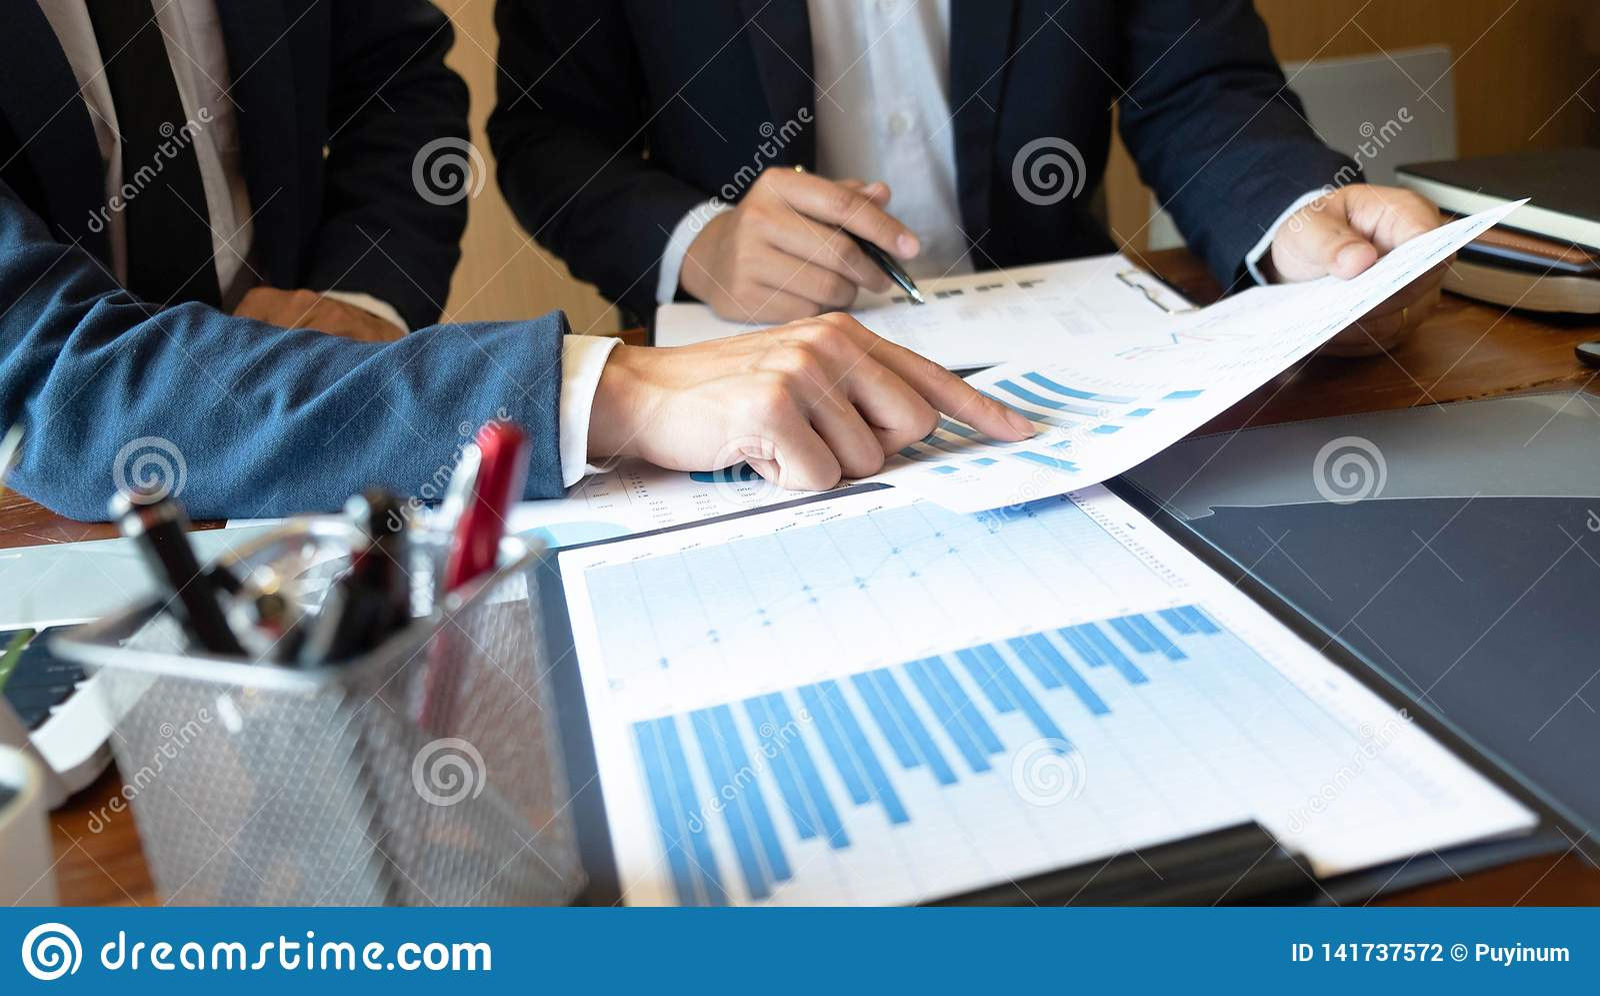 Buchhaltungs-Berater, Unternehmensberater-Financial Consultant Financial-Planungs-Planung